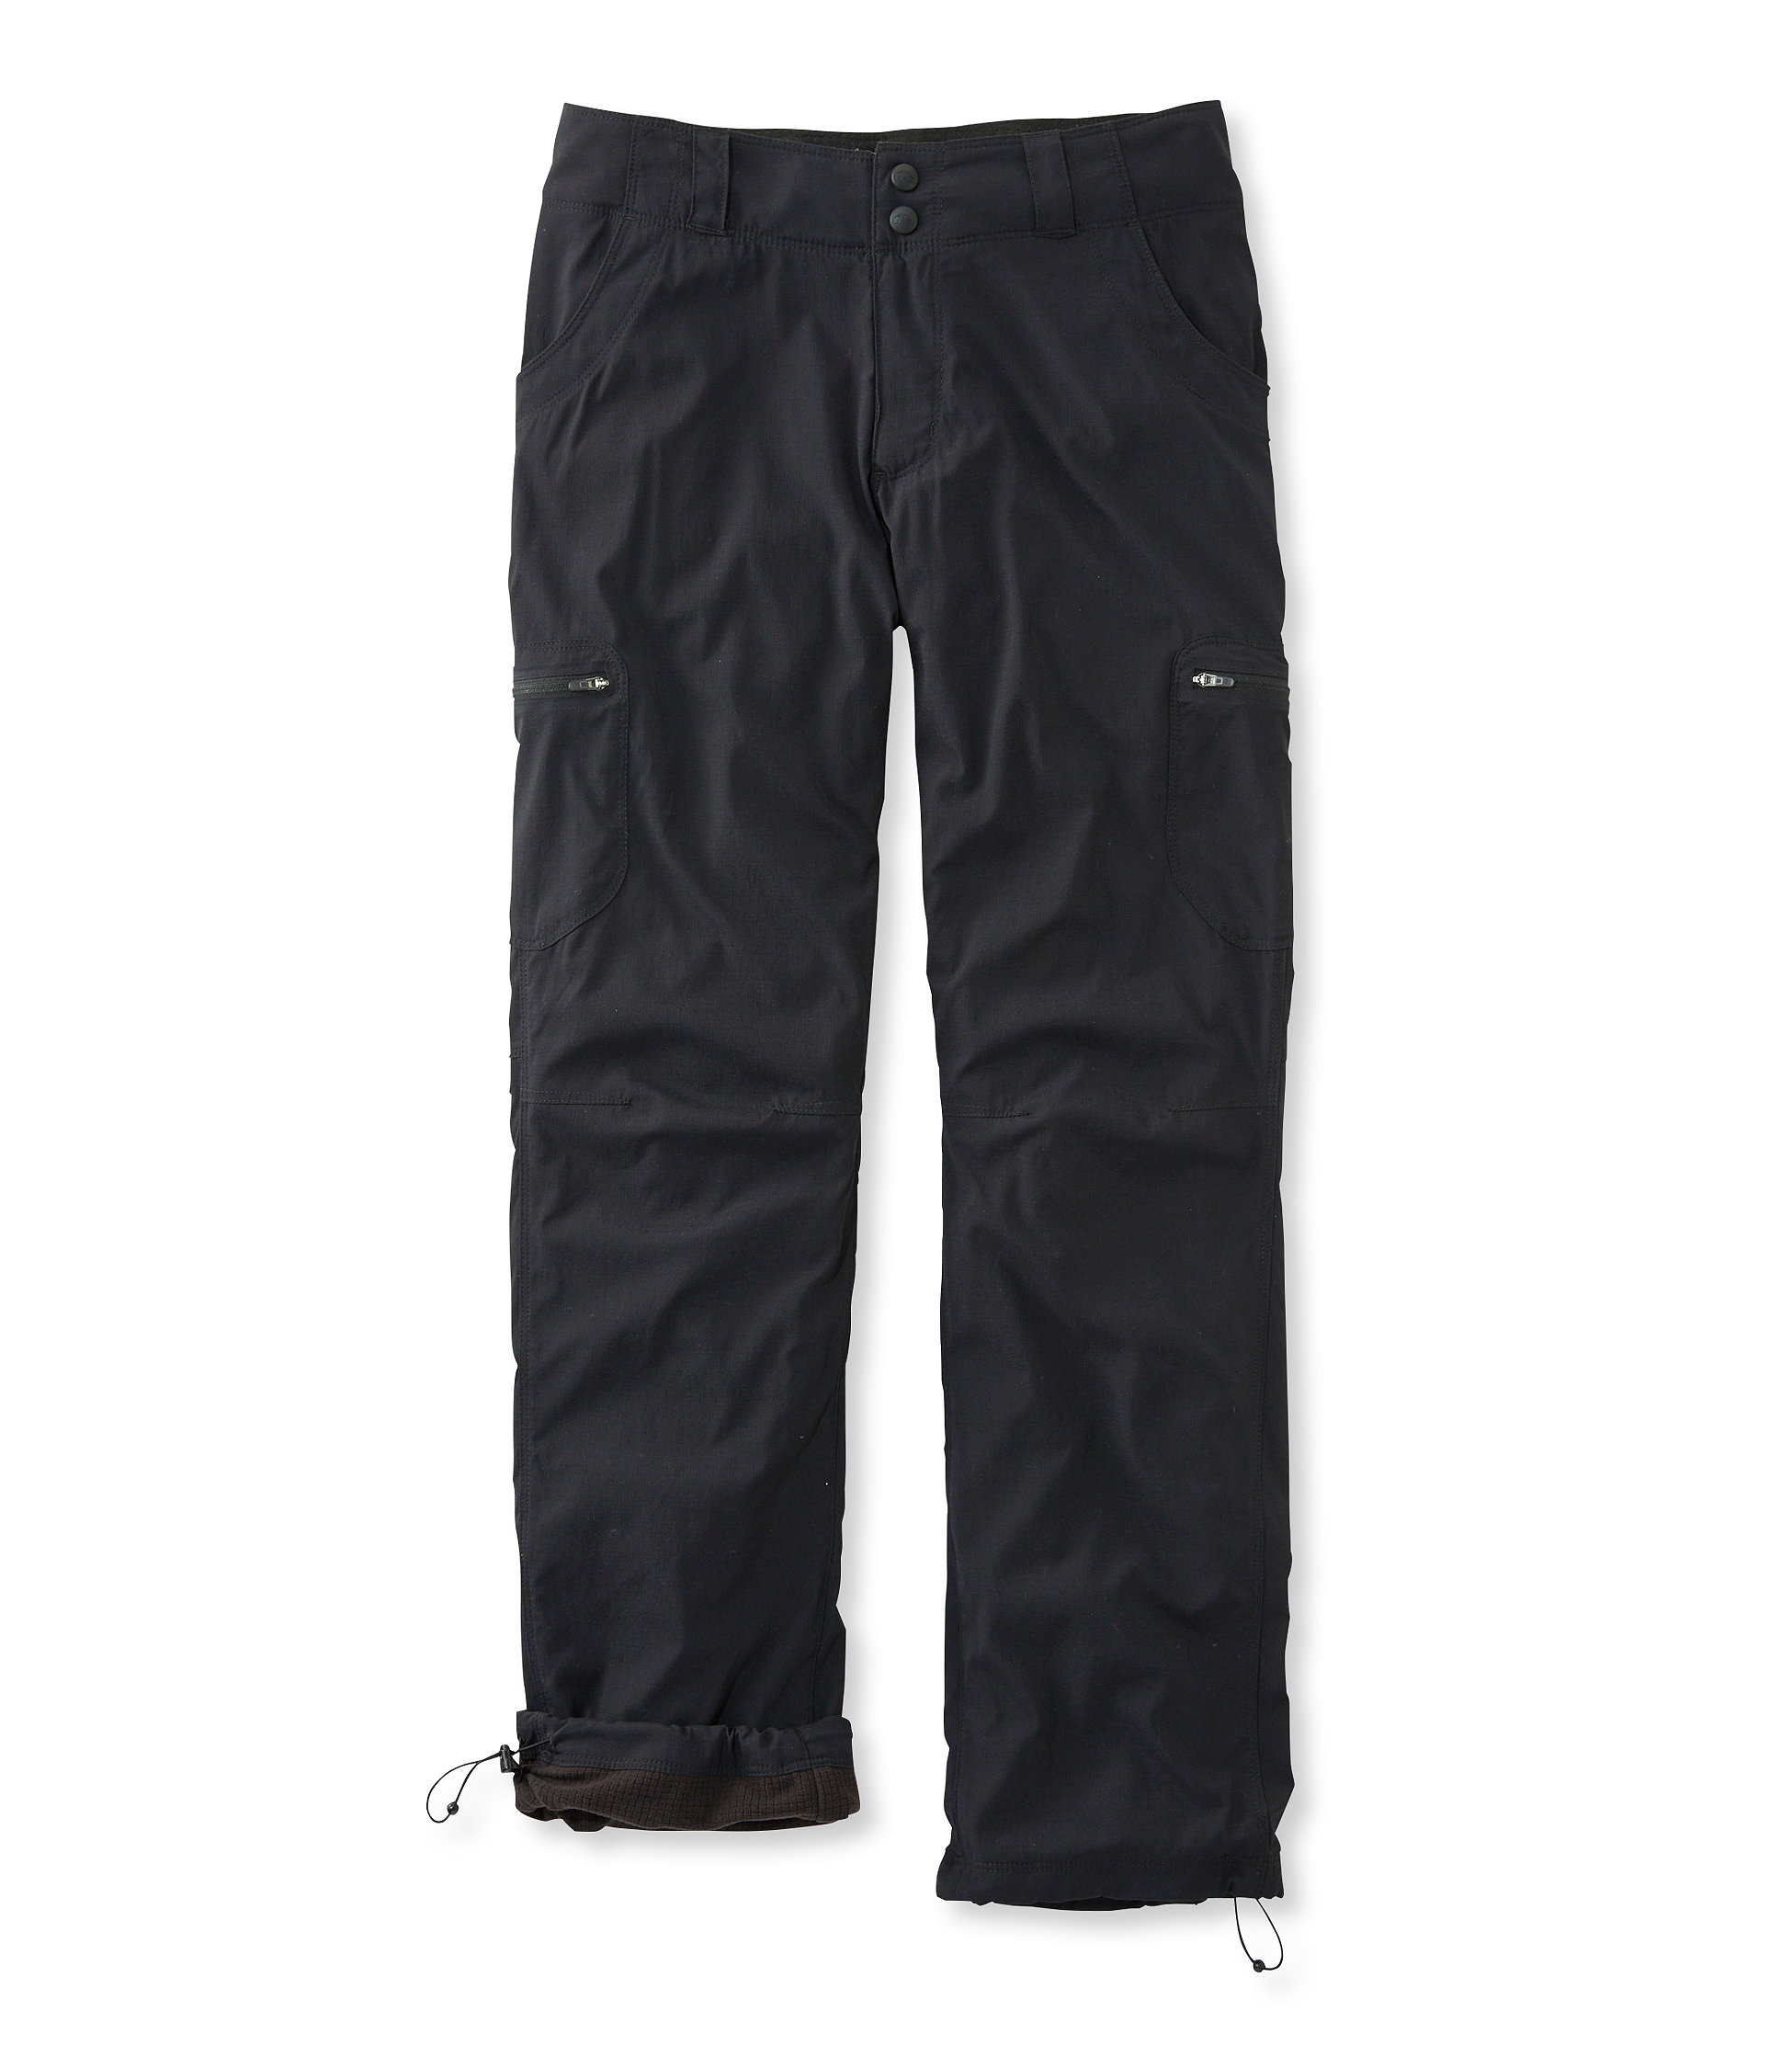 L.L.Bean Vista Trekking Pants, Lined